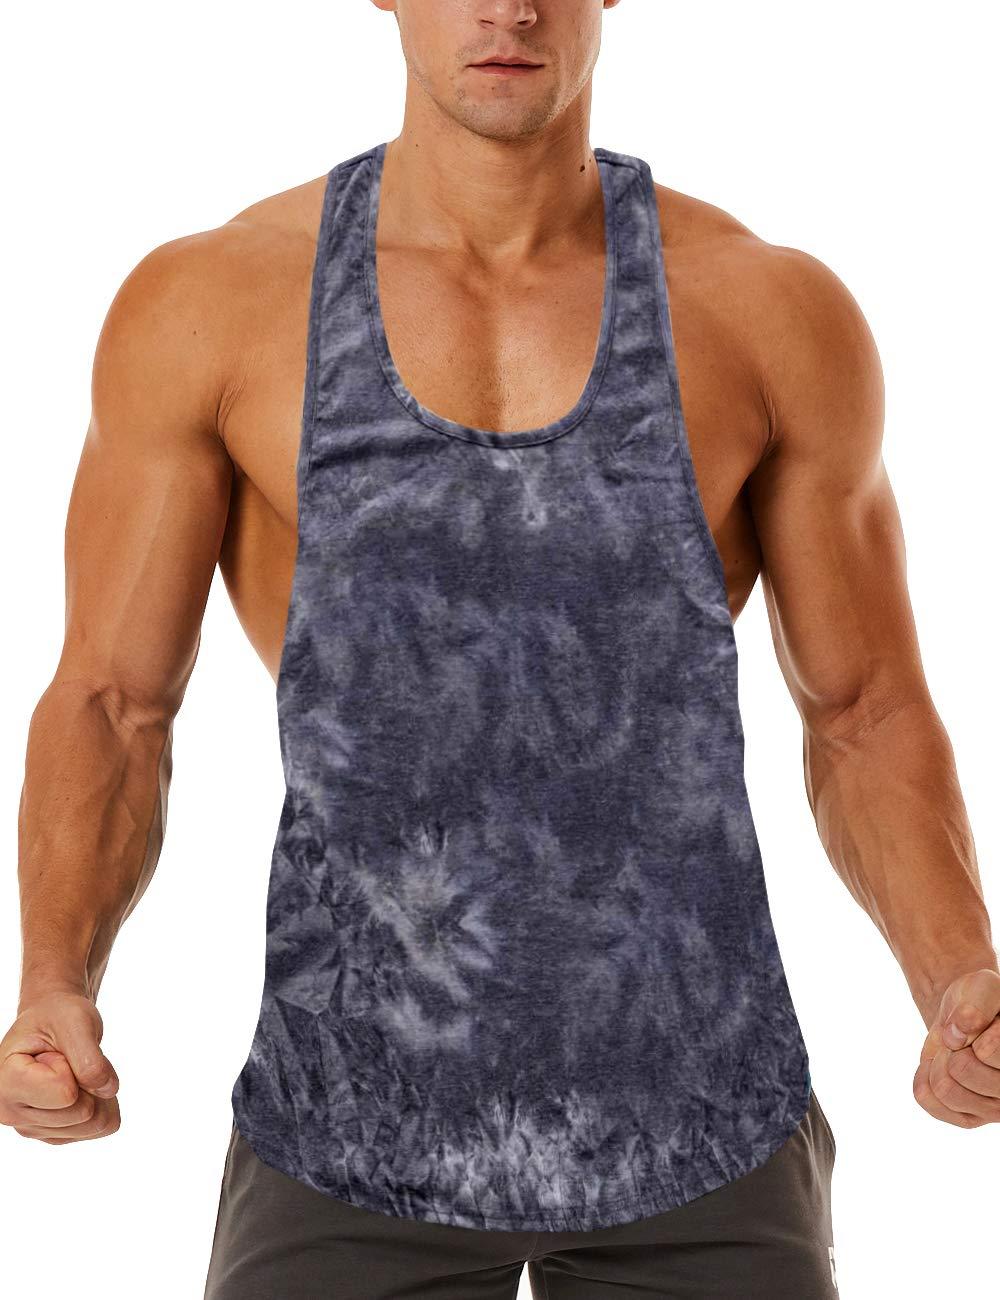 ROWILUX Men's Workout Tie Dye Tank Tops Quick Dry Soft Gym Bodybuilding Stringer Sleeveless Shirt